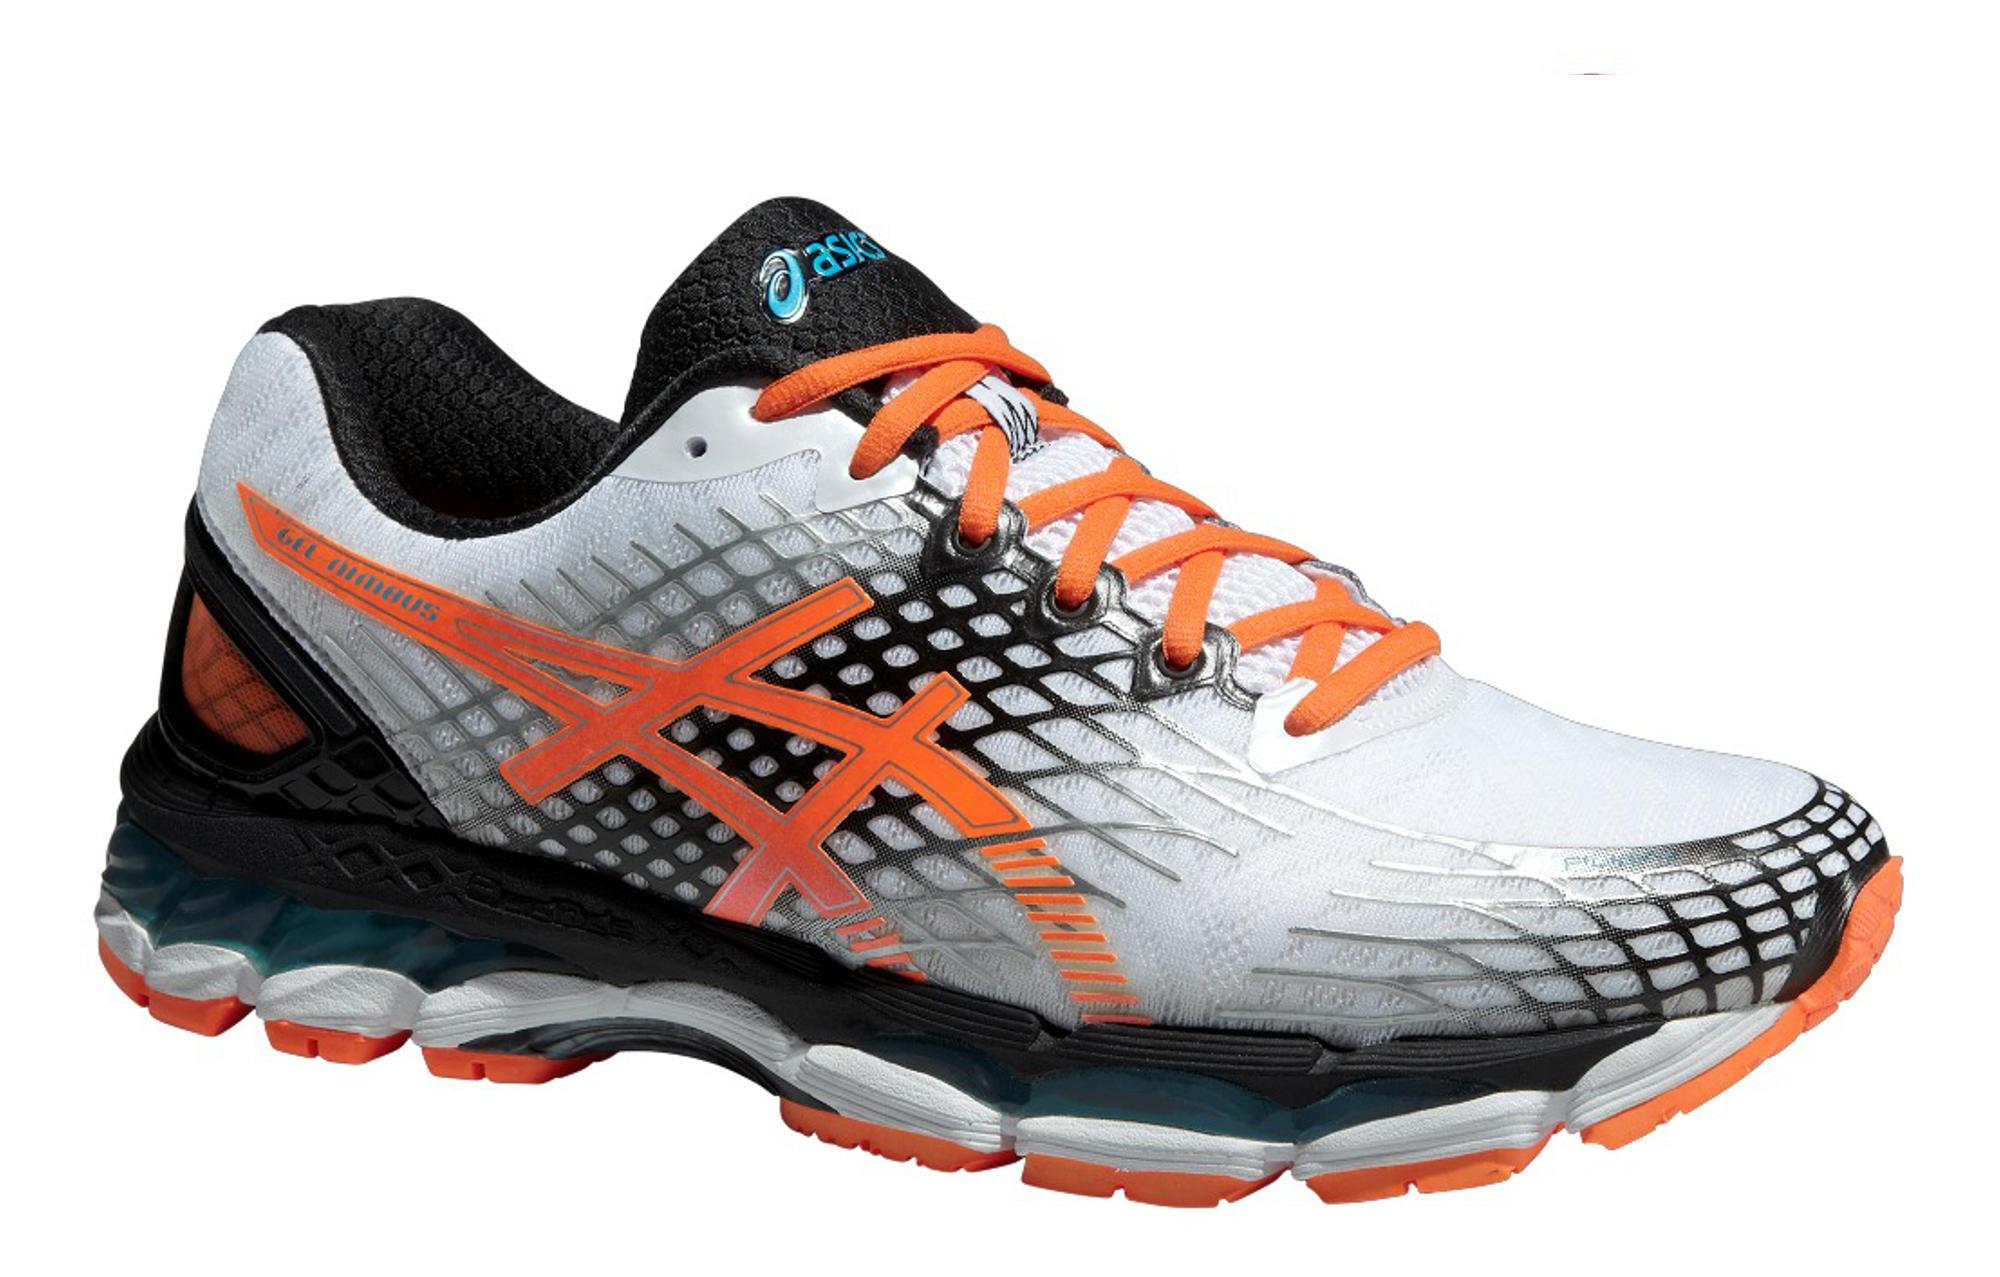 chaussures asics gel-nimbus 17 blanc orange noir